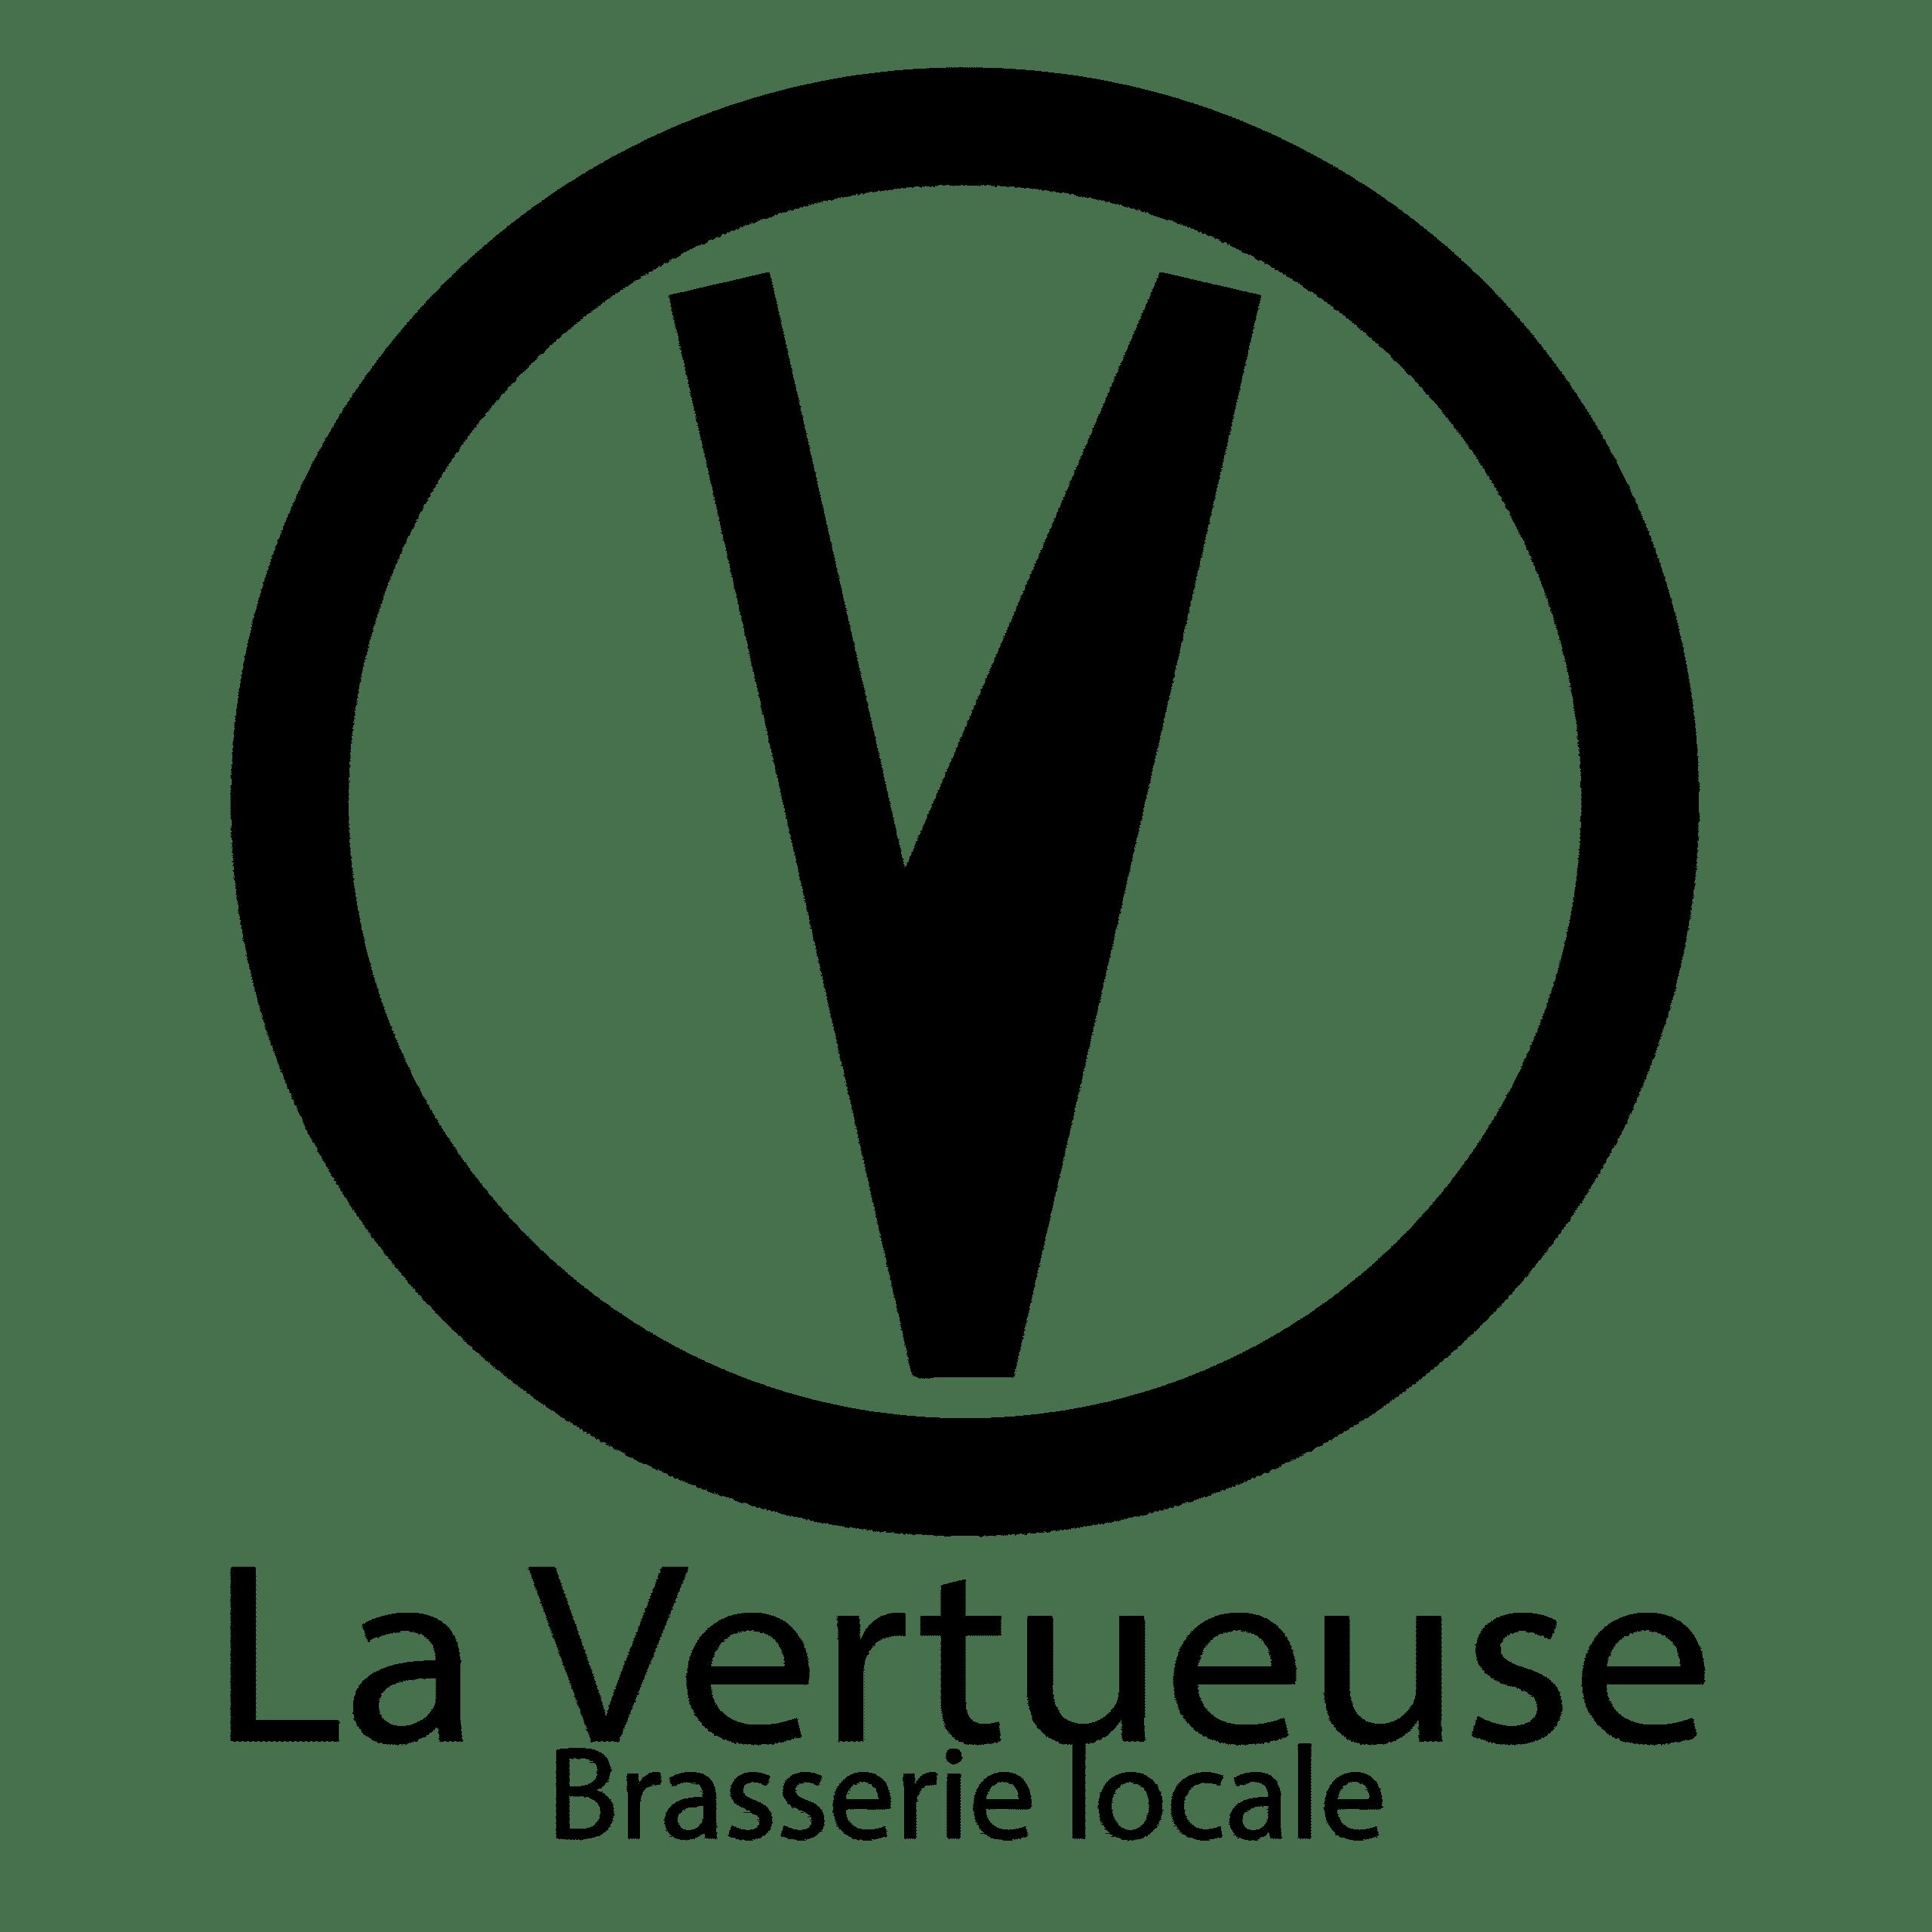 vertueuse-brasserie-locale-noir-sansfond-01-01